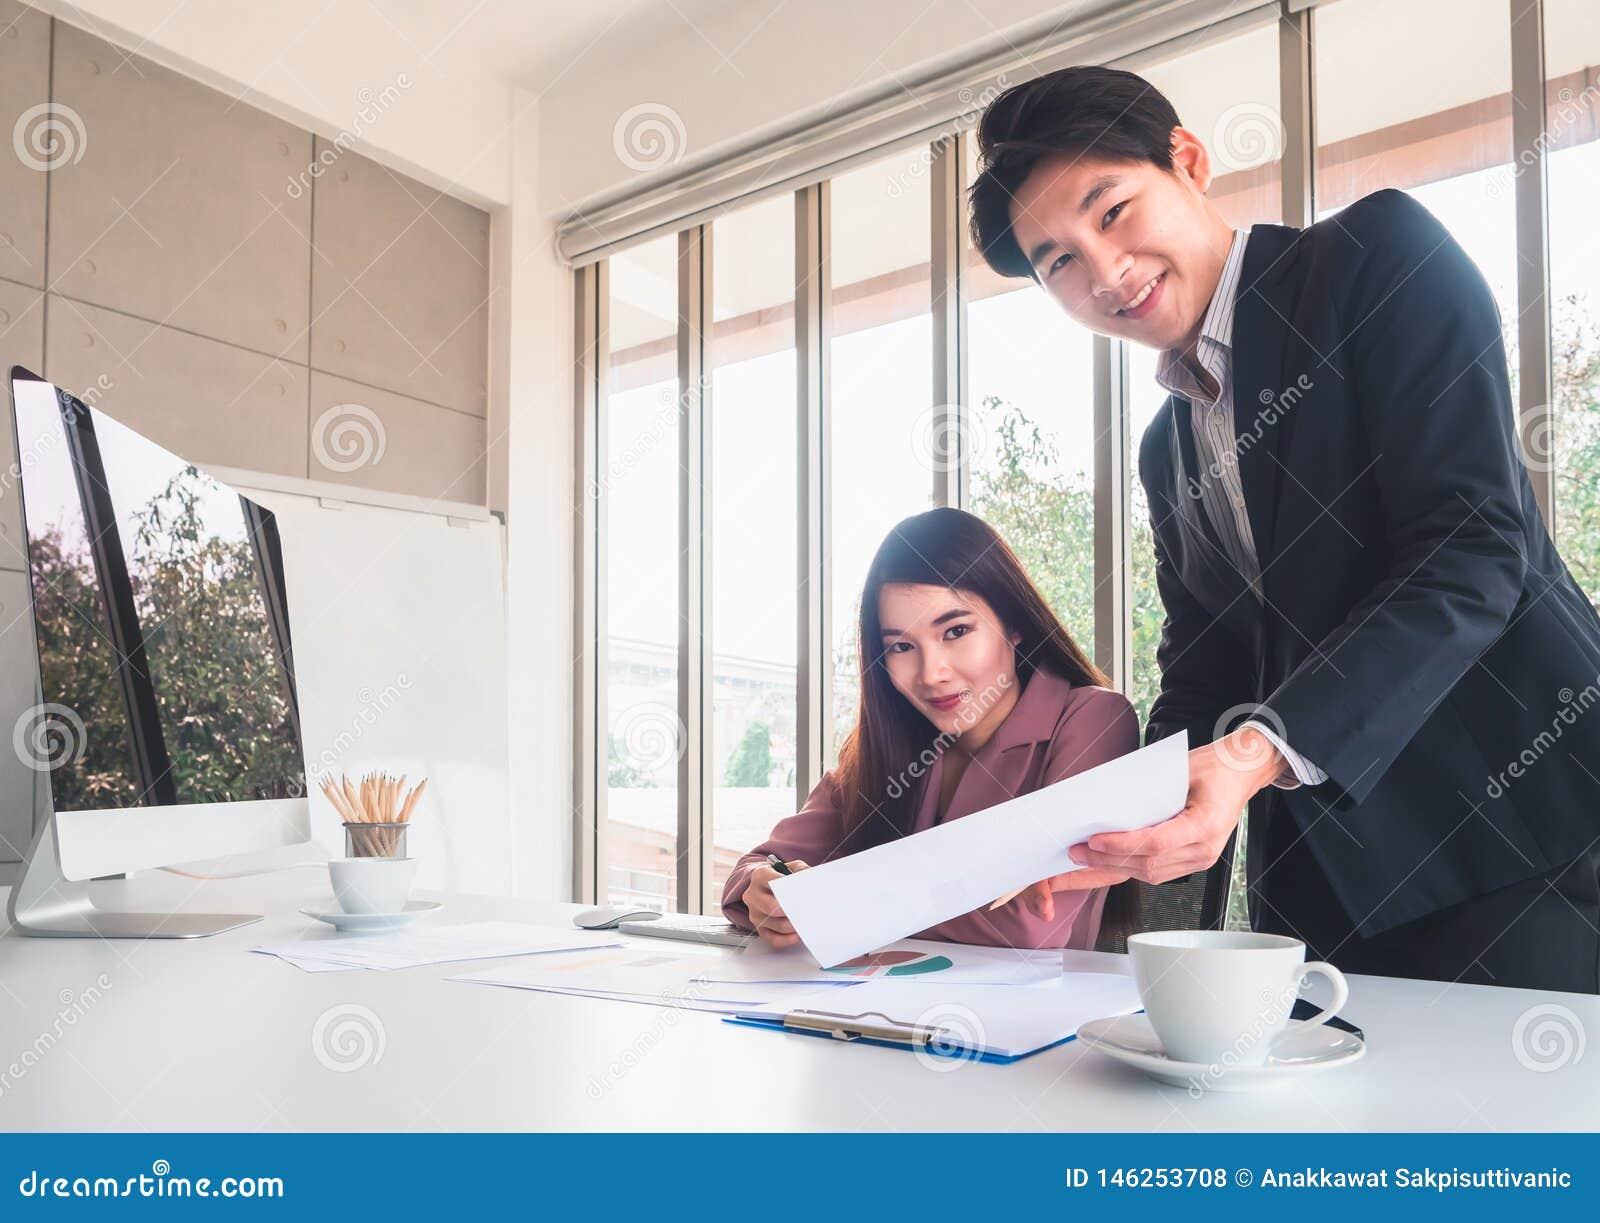 Asian handsome businessman explain job details to beautiful businesswoman